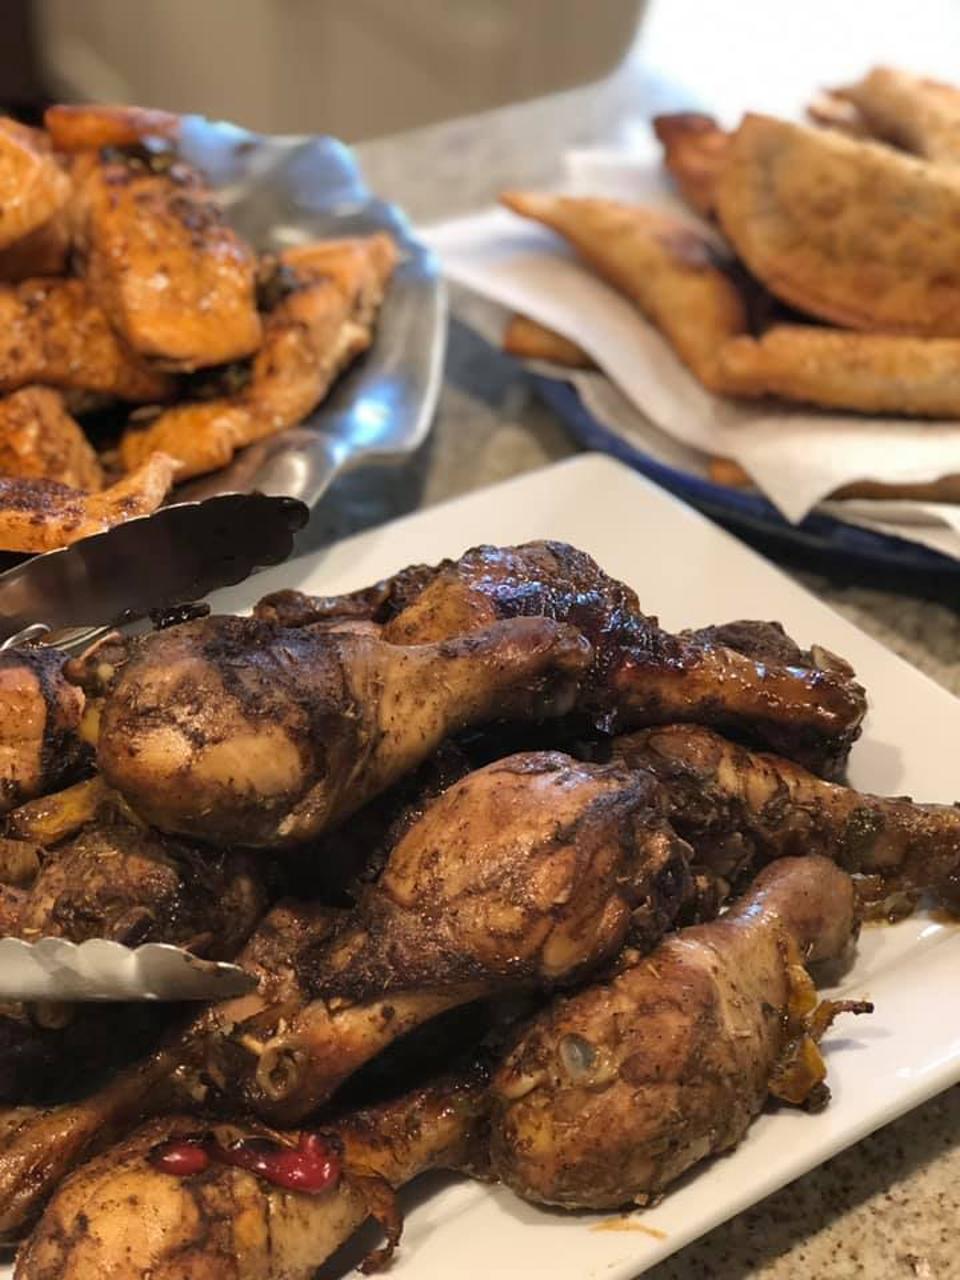 Chicken, fish and empanadas.